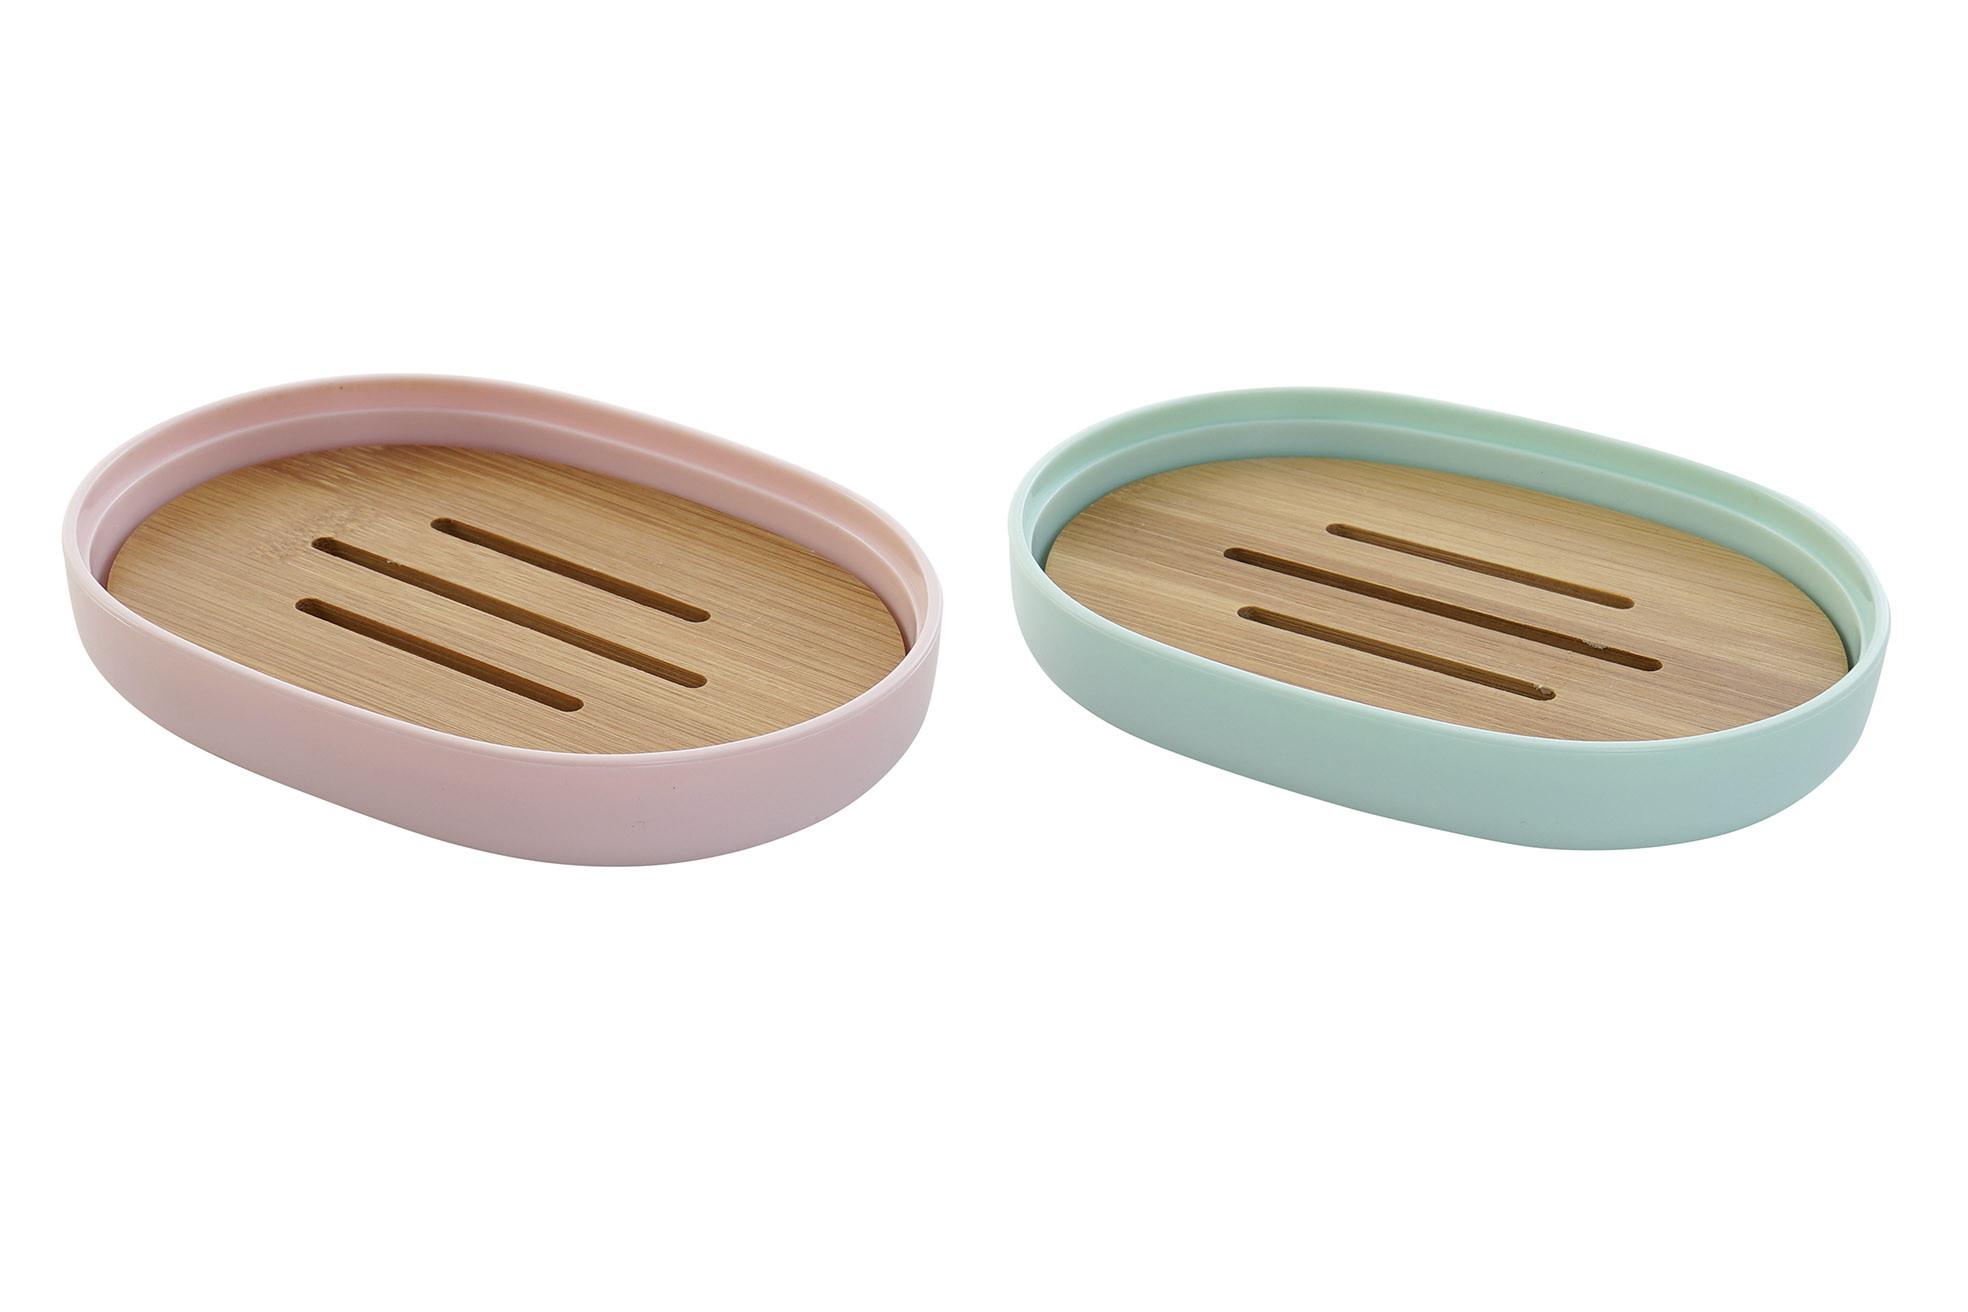 Jabonera Baño de Bambú, 2 Modelos a elegir. Diseño Original 13X9,5X2,5 cm.-Hogarymas-